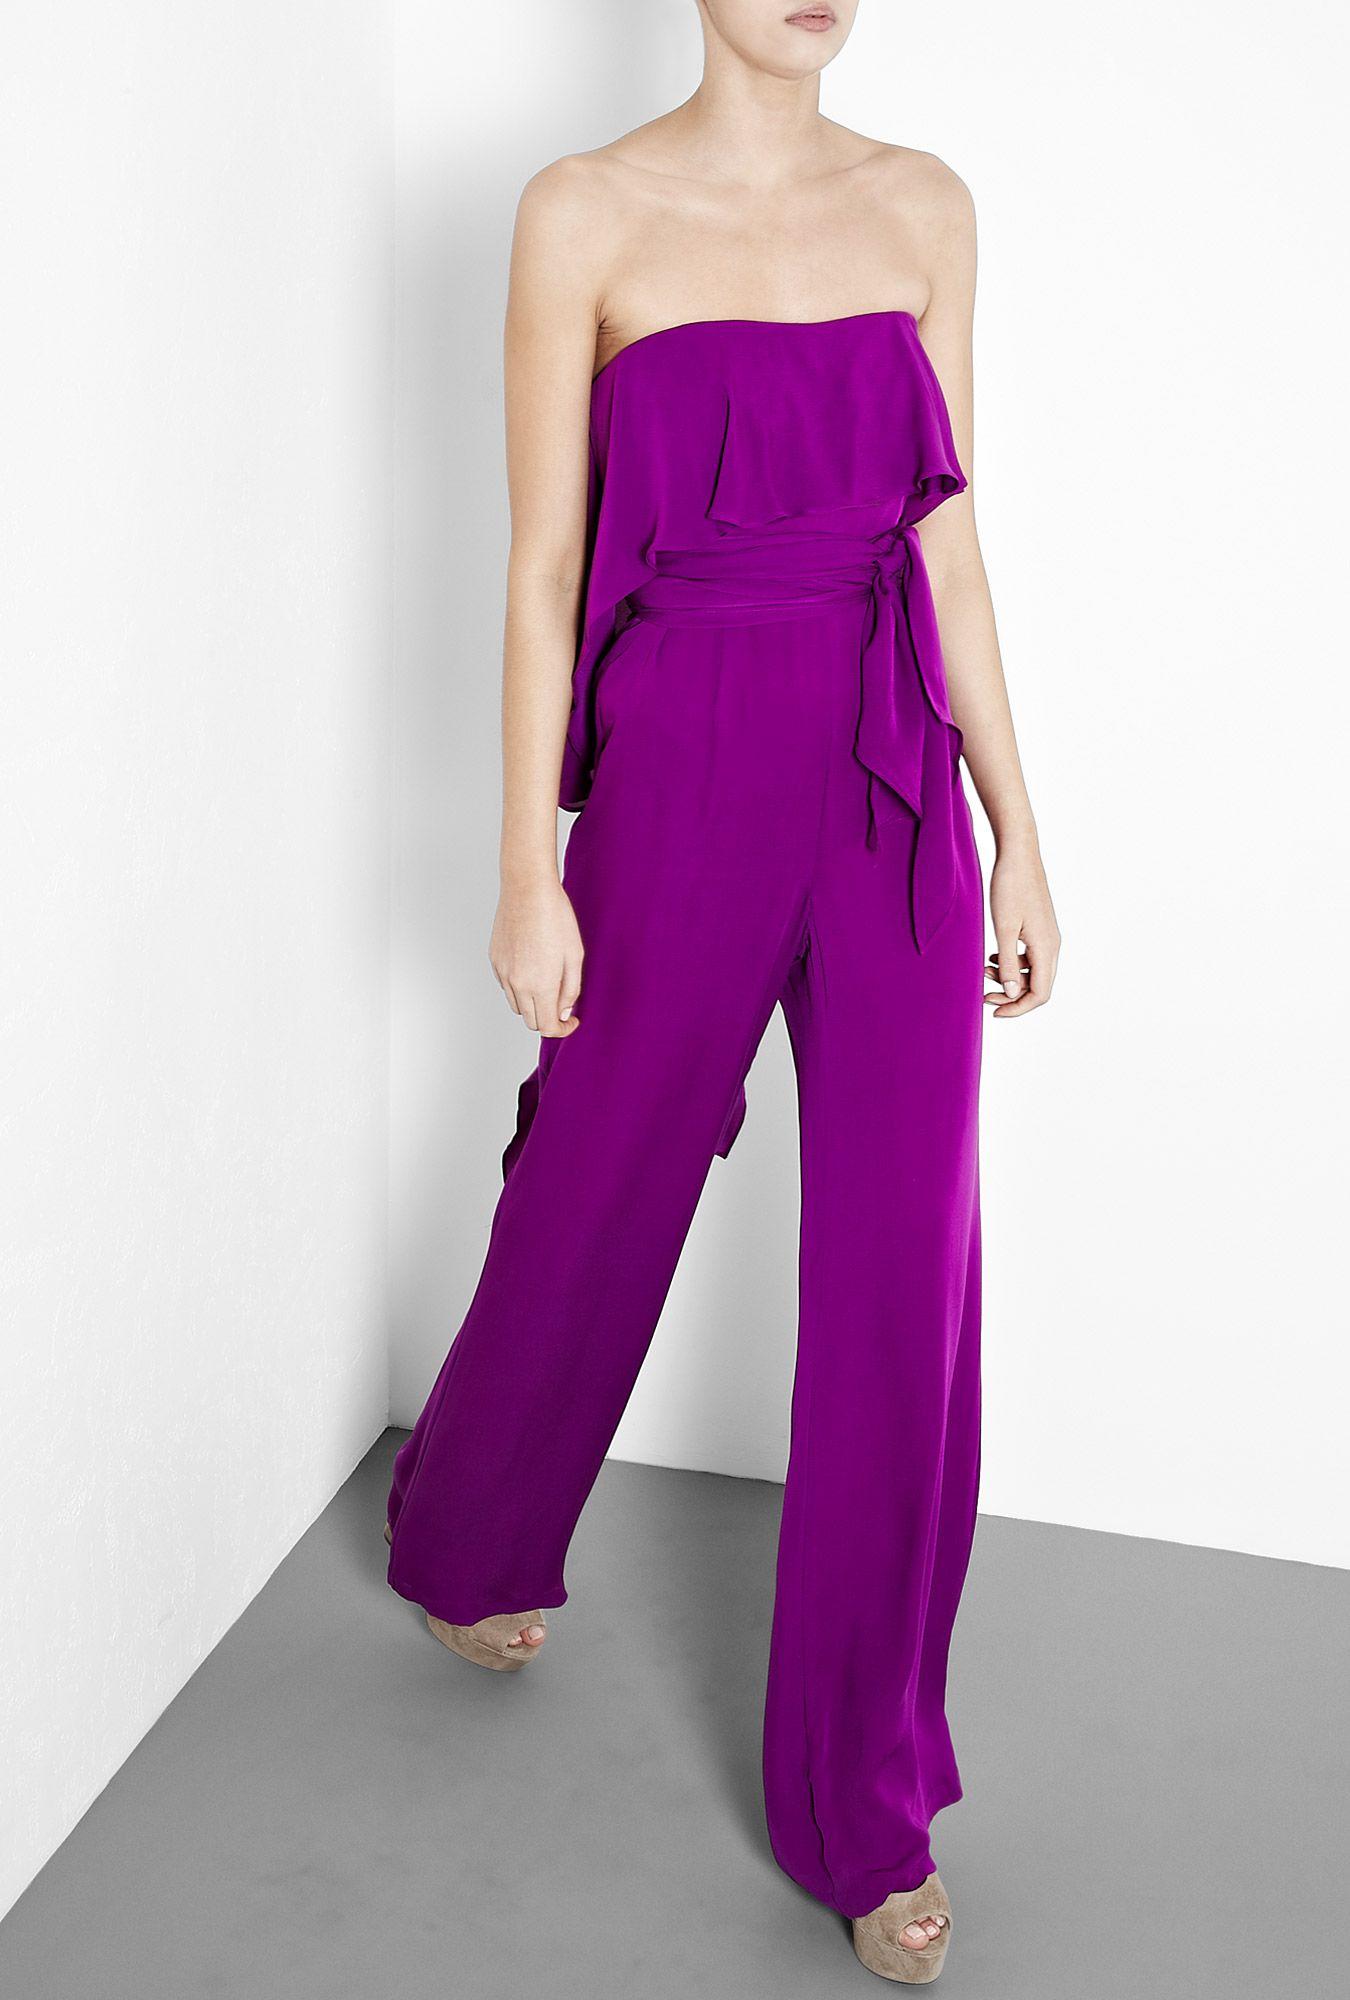 Violet Strapless Silk Jumpsuit by Halston Heritage. Los monos de ...